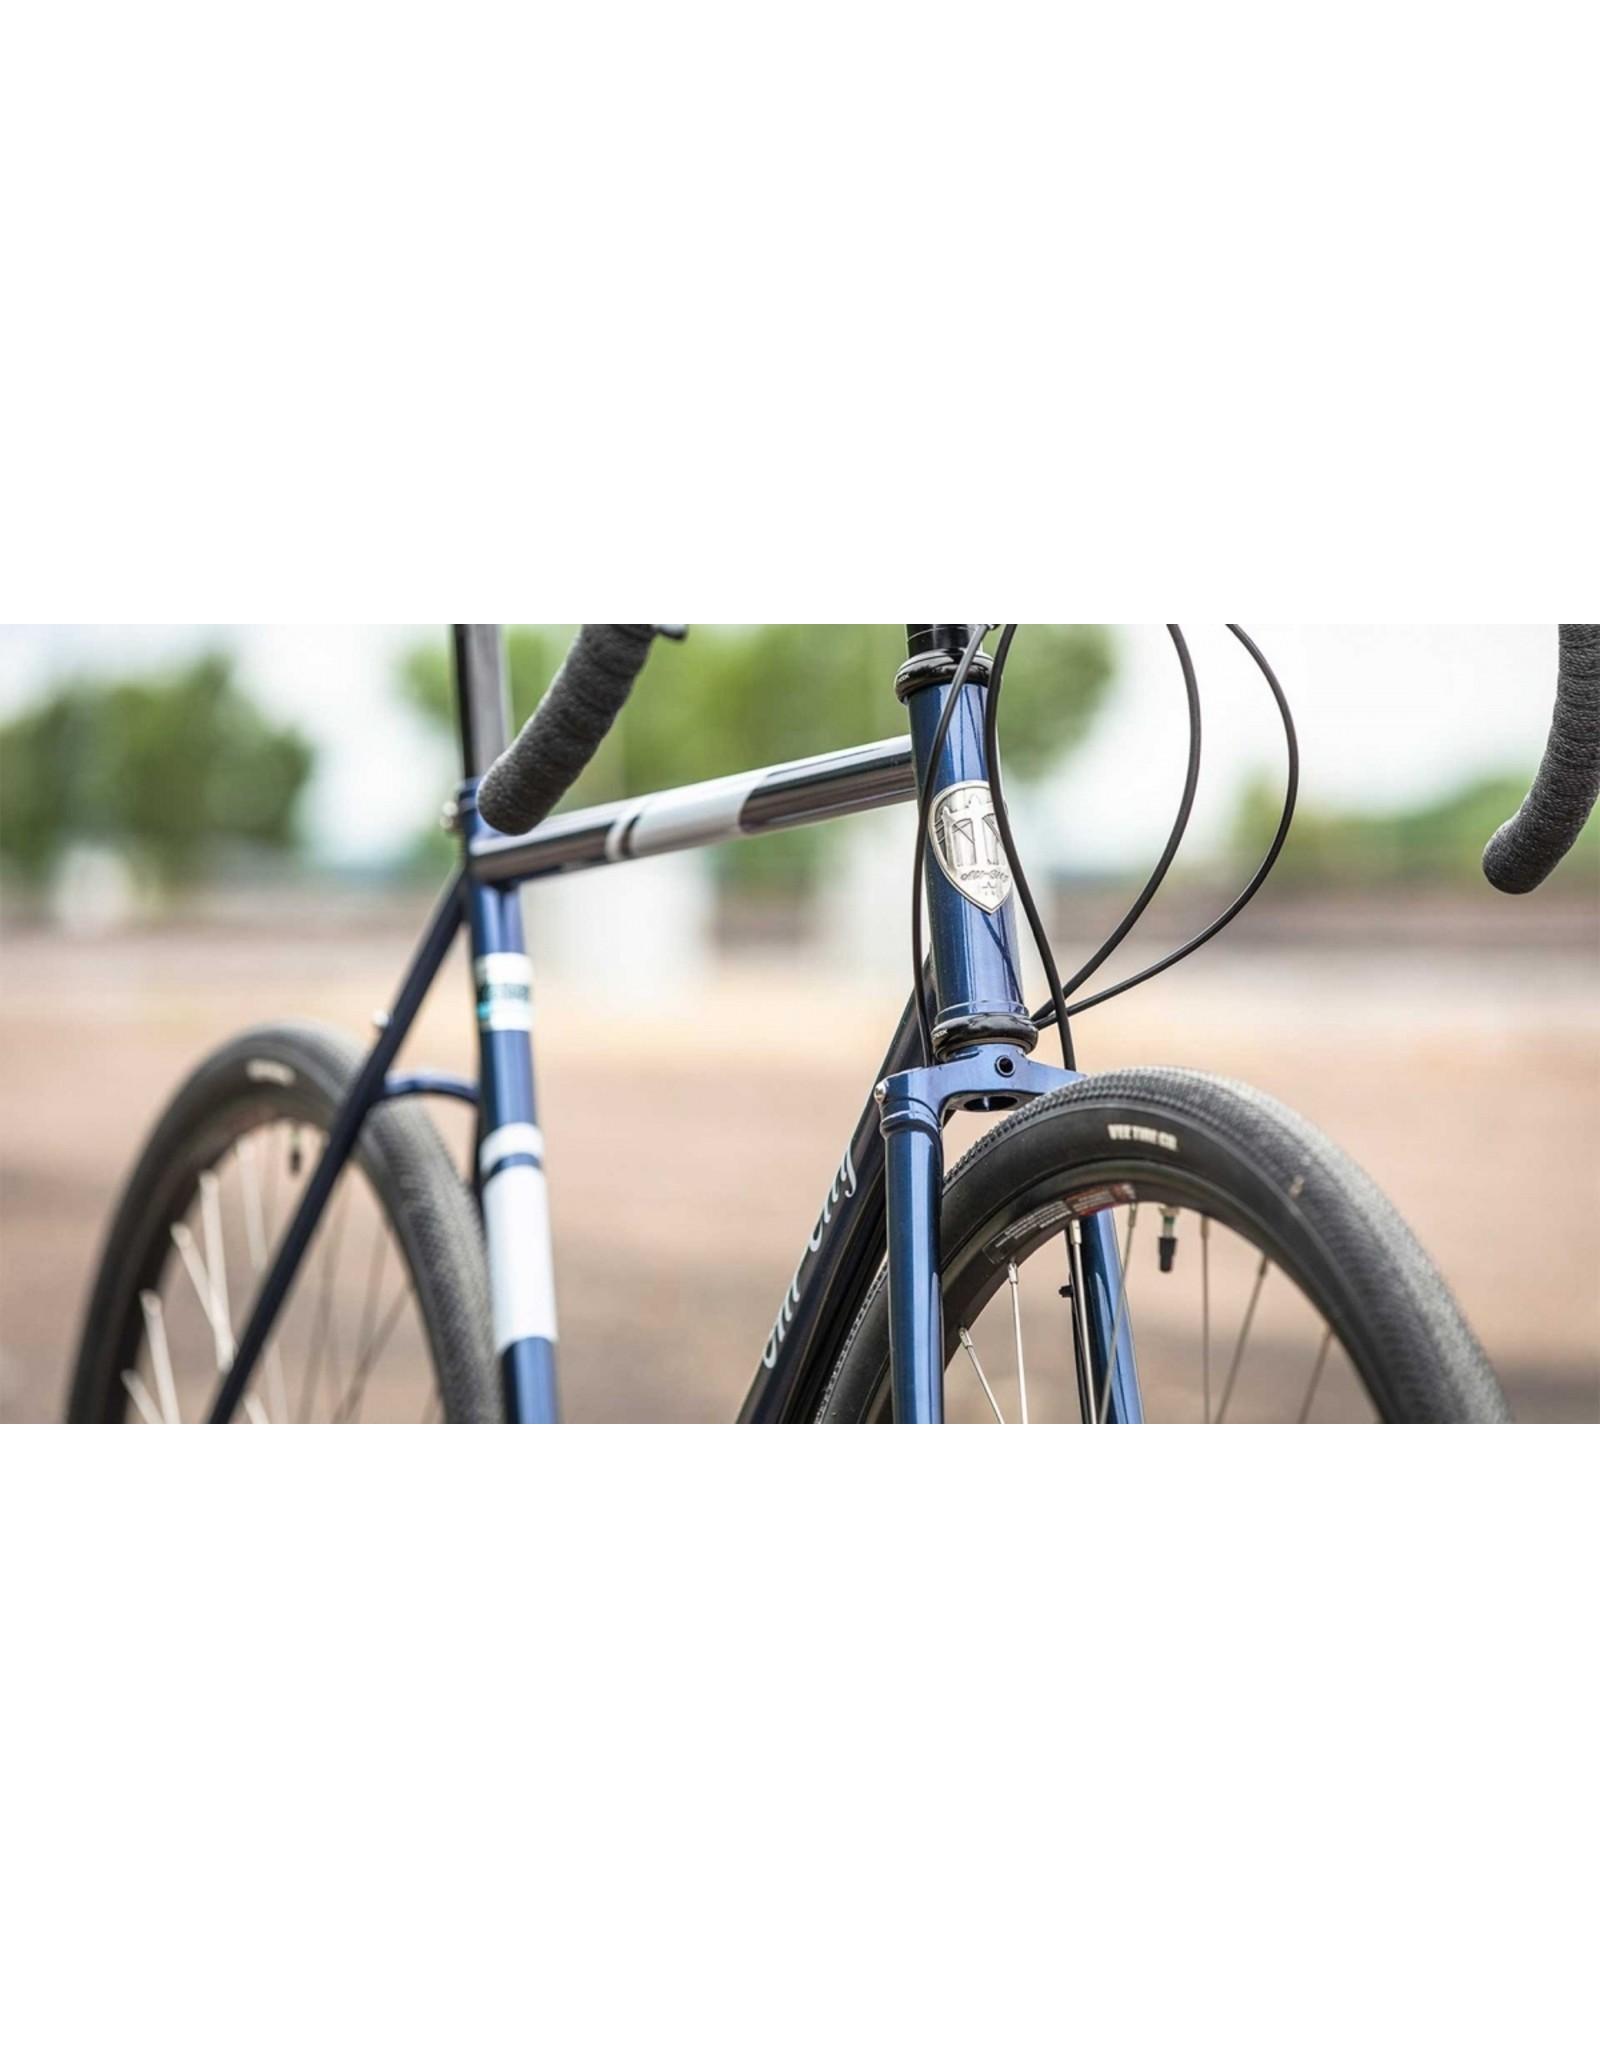 All-City All-City Space Horse Bike - Tiagra, Neptune Blue, 52cm 700c, Steel,